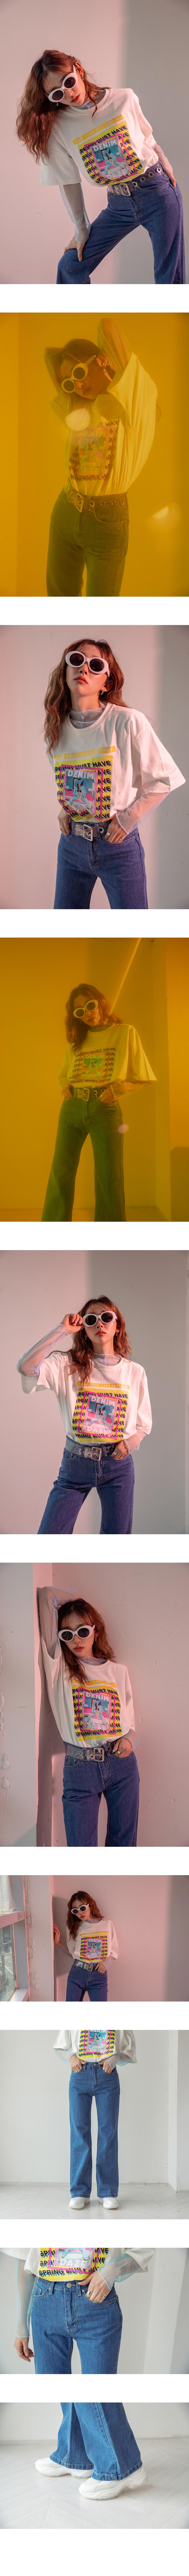 Neon mesh layered polo shirt